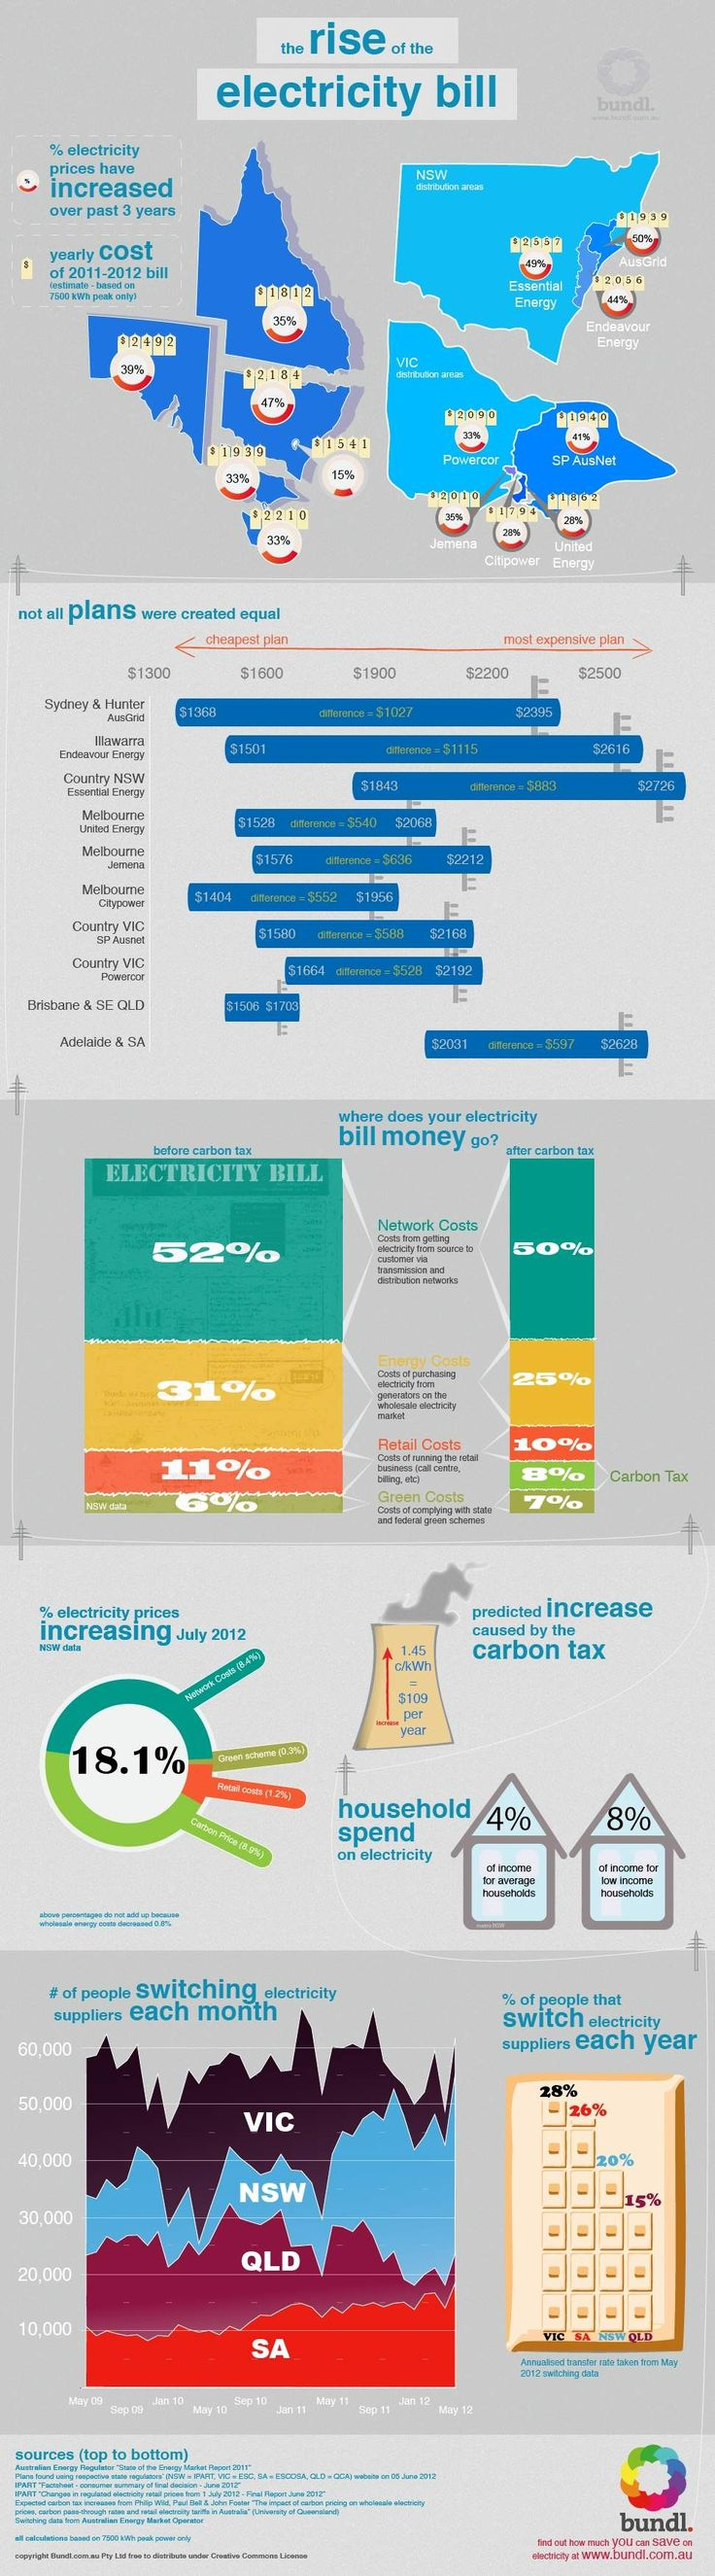 How Electricity Prices Vary Between States | Lifehacker Australia